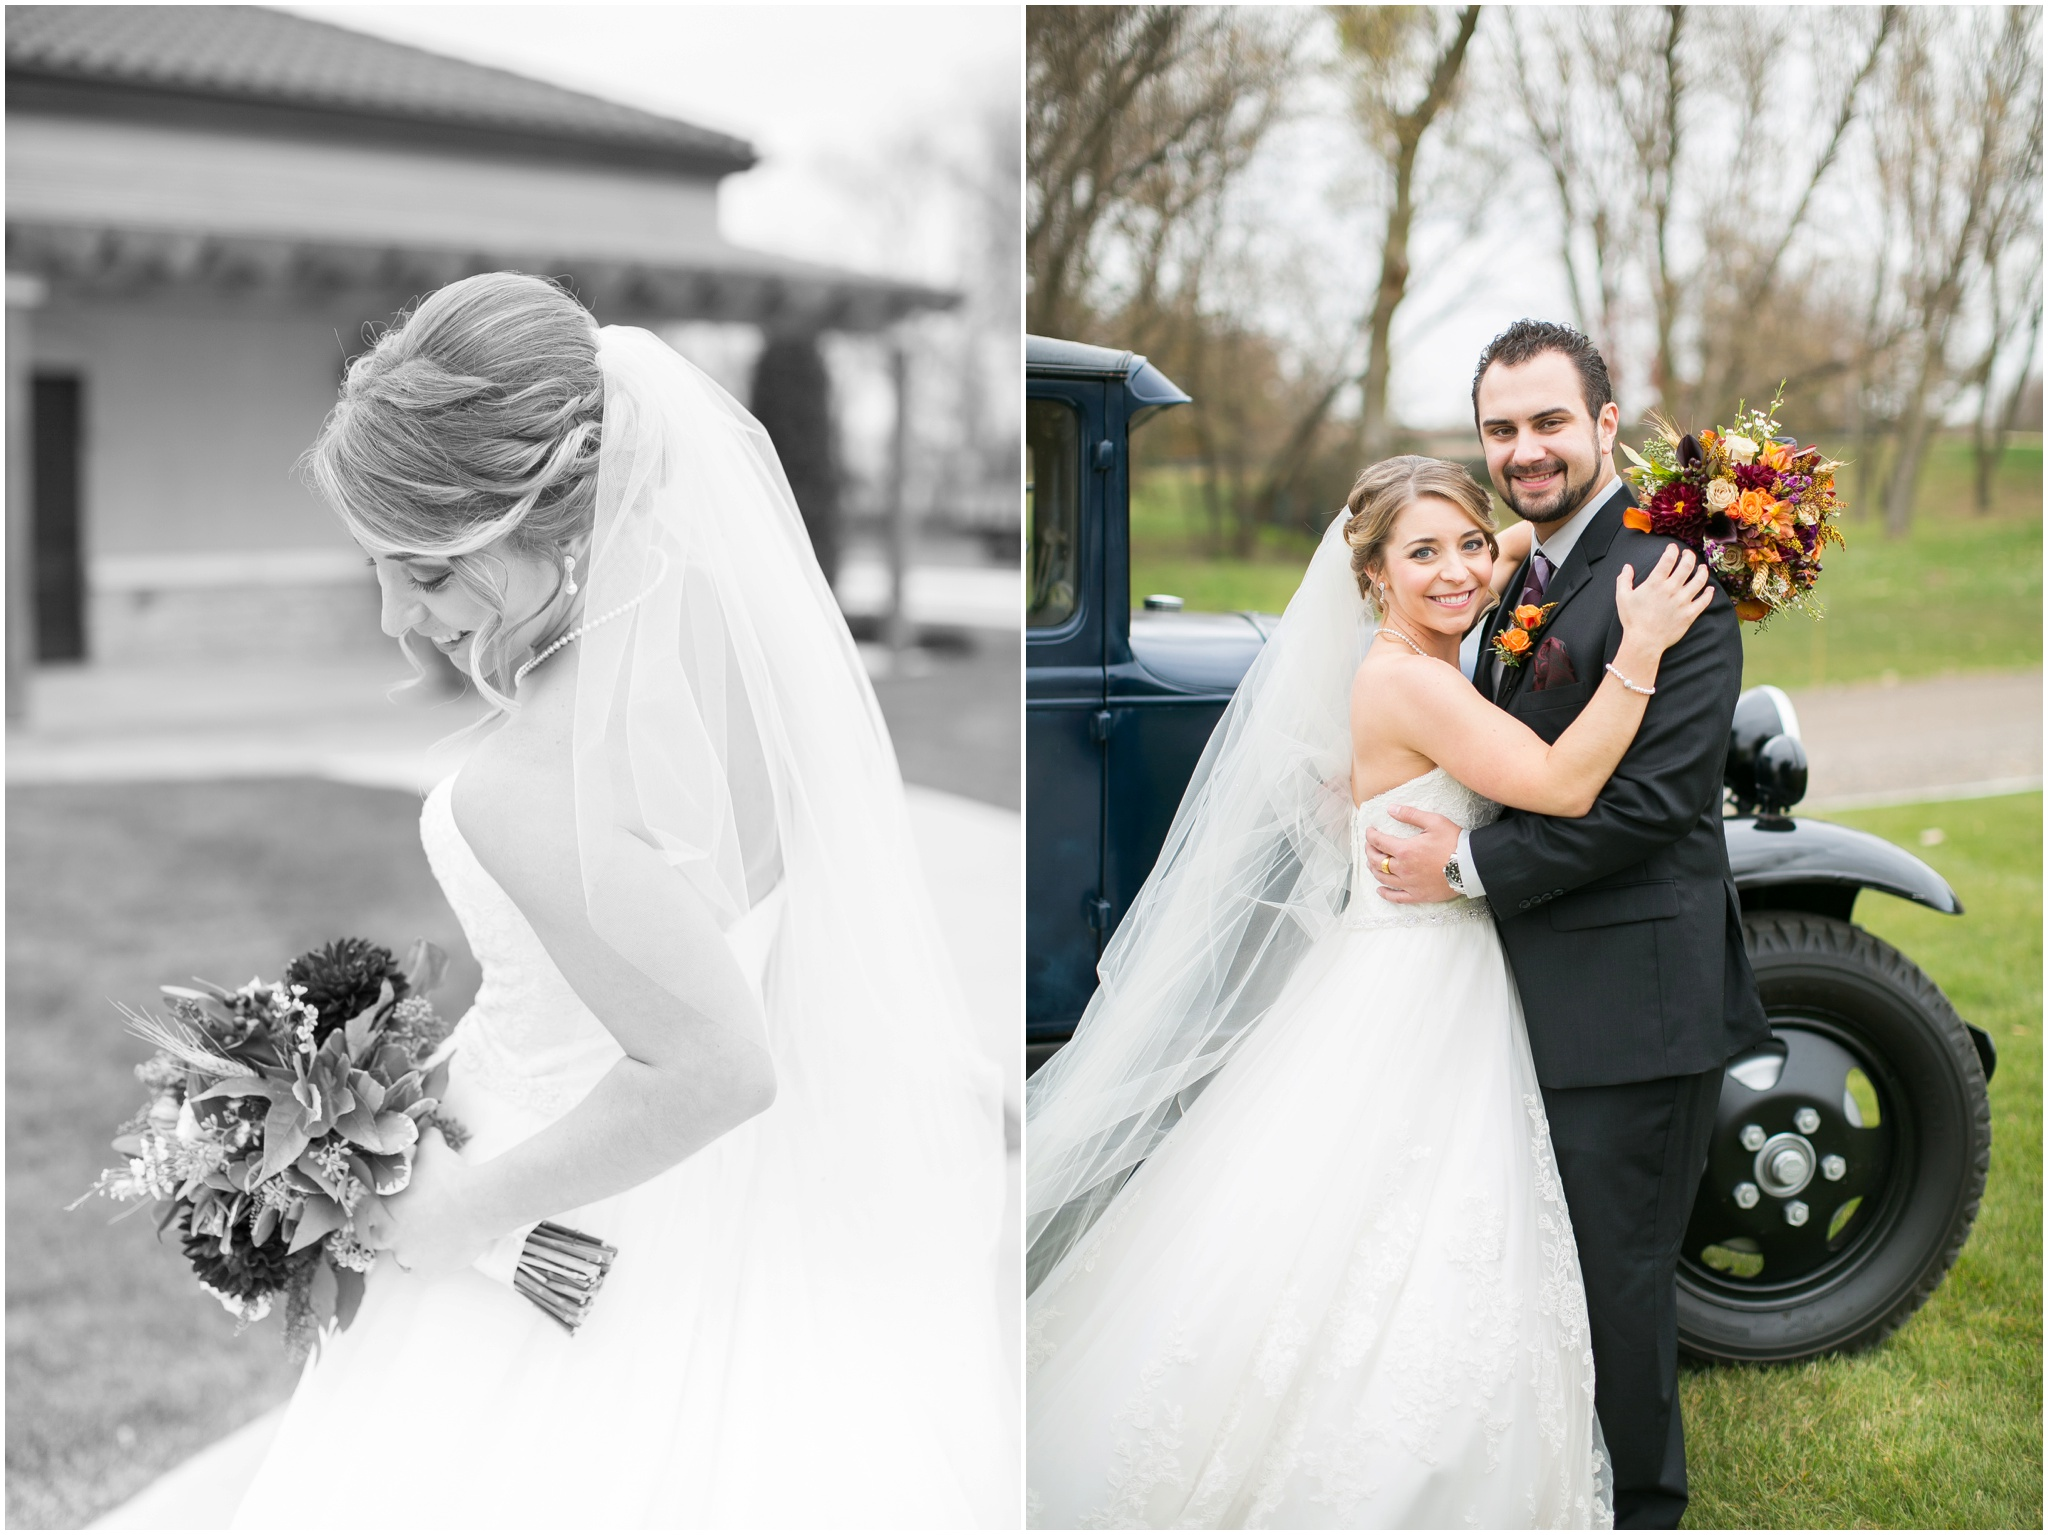 DC_Estate_Winery_Wedding_Beloit_Illinois_Wedding_0033.jpg